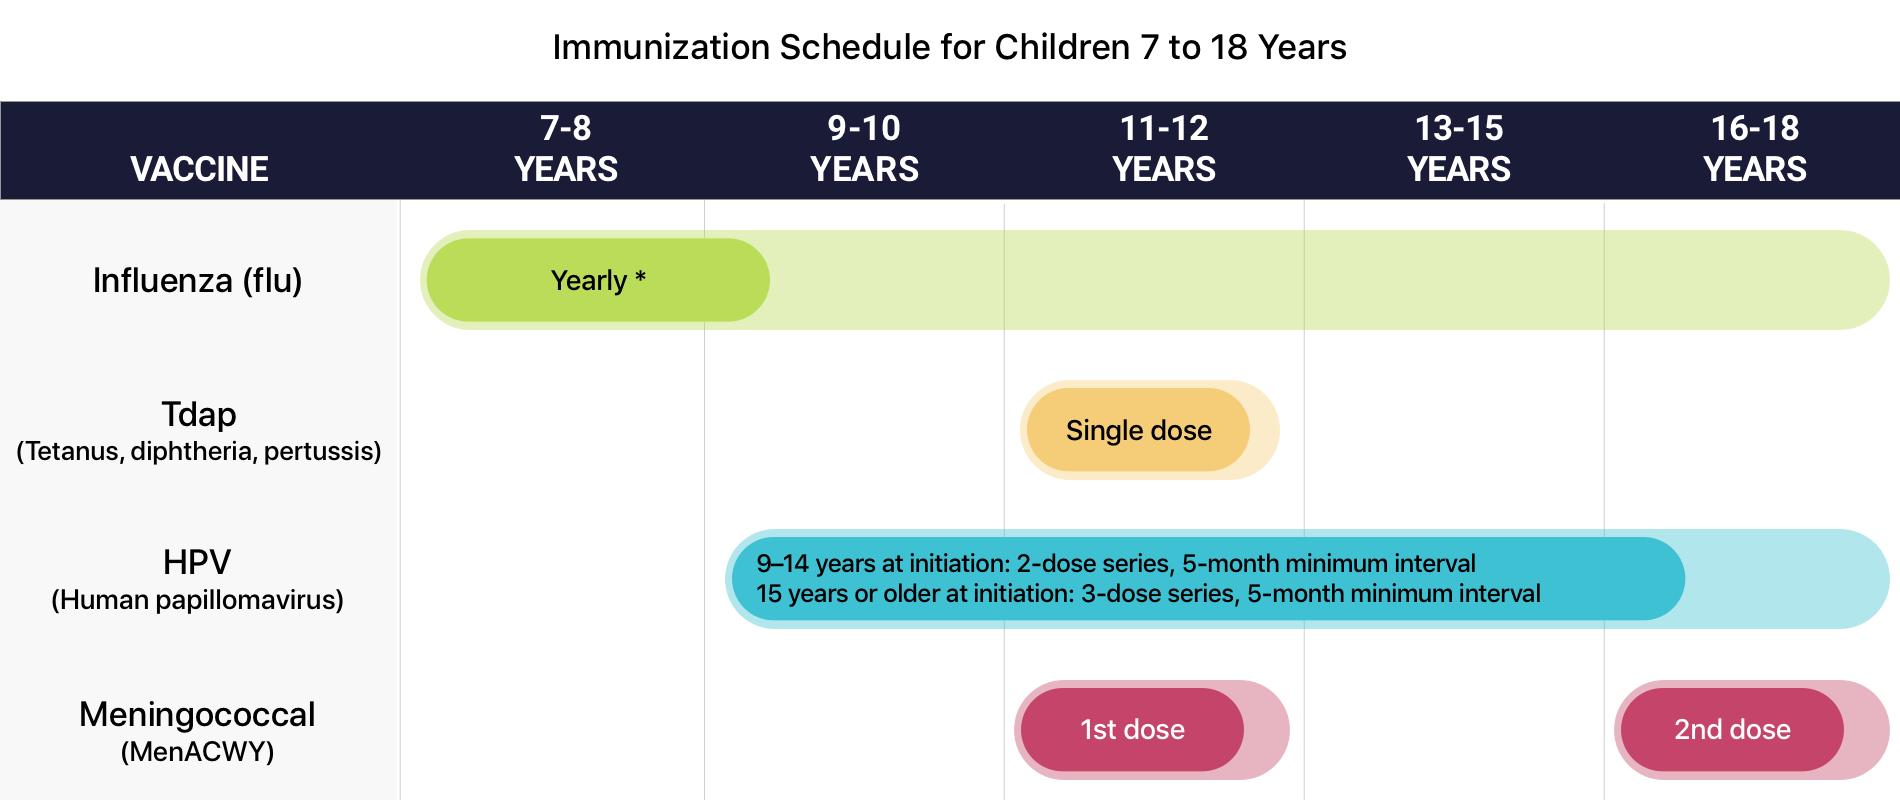 human papillomavirus vaccination doses)